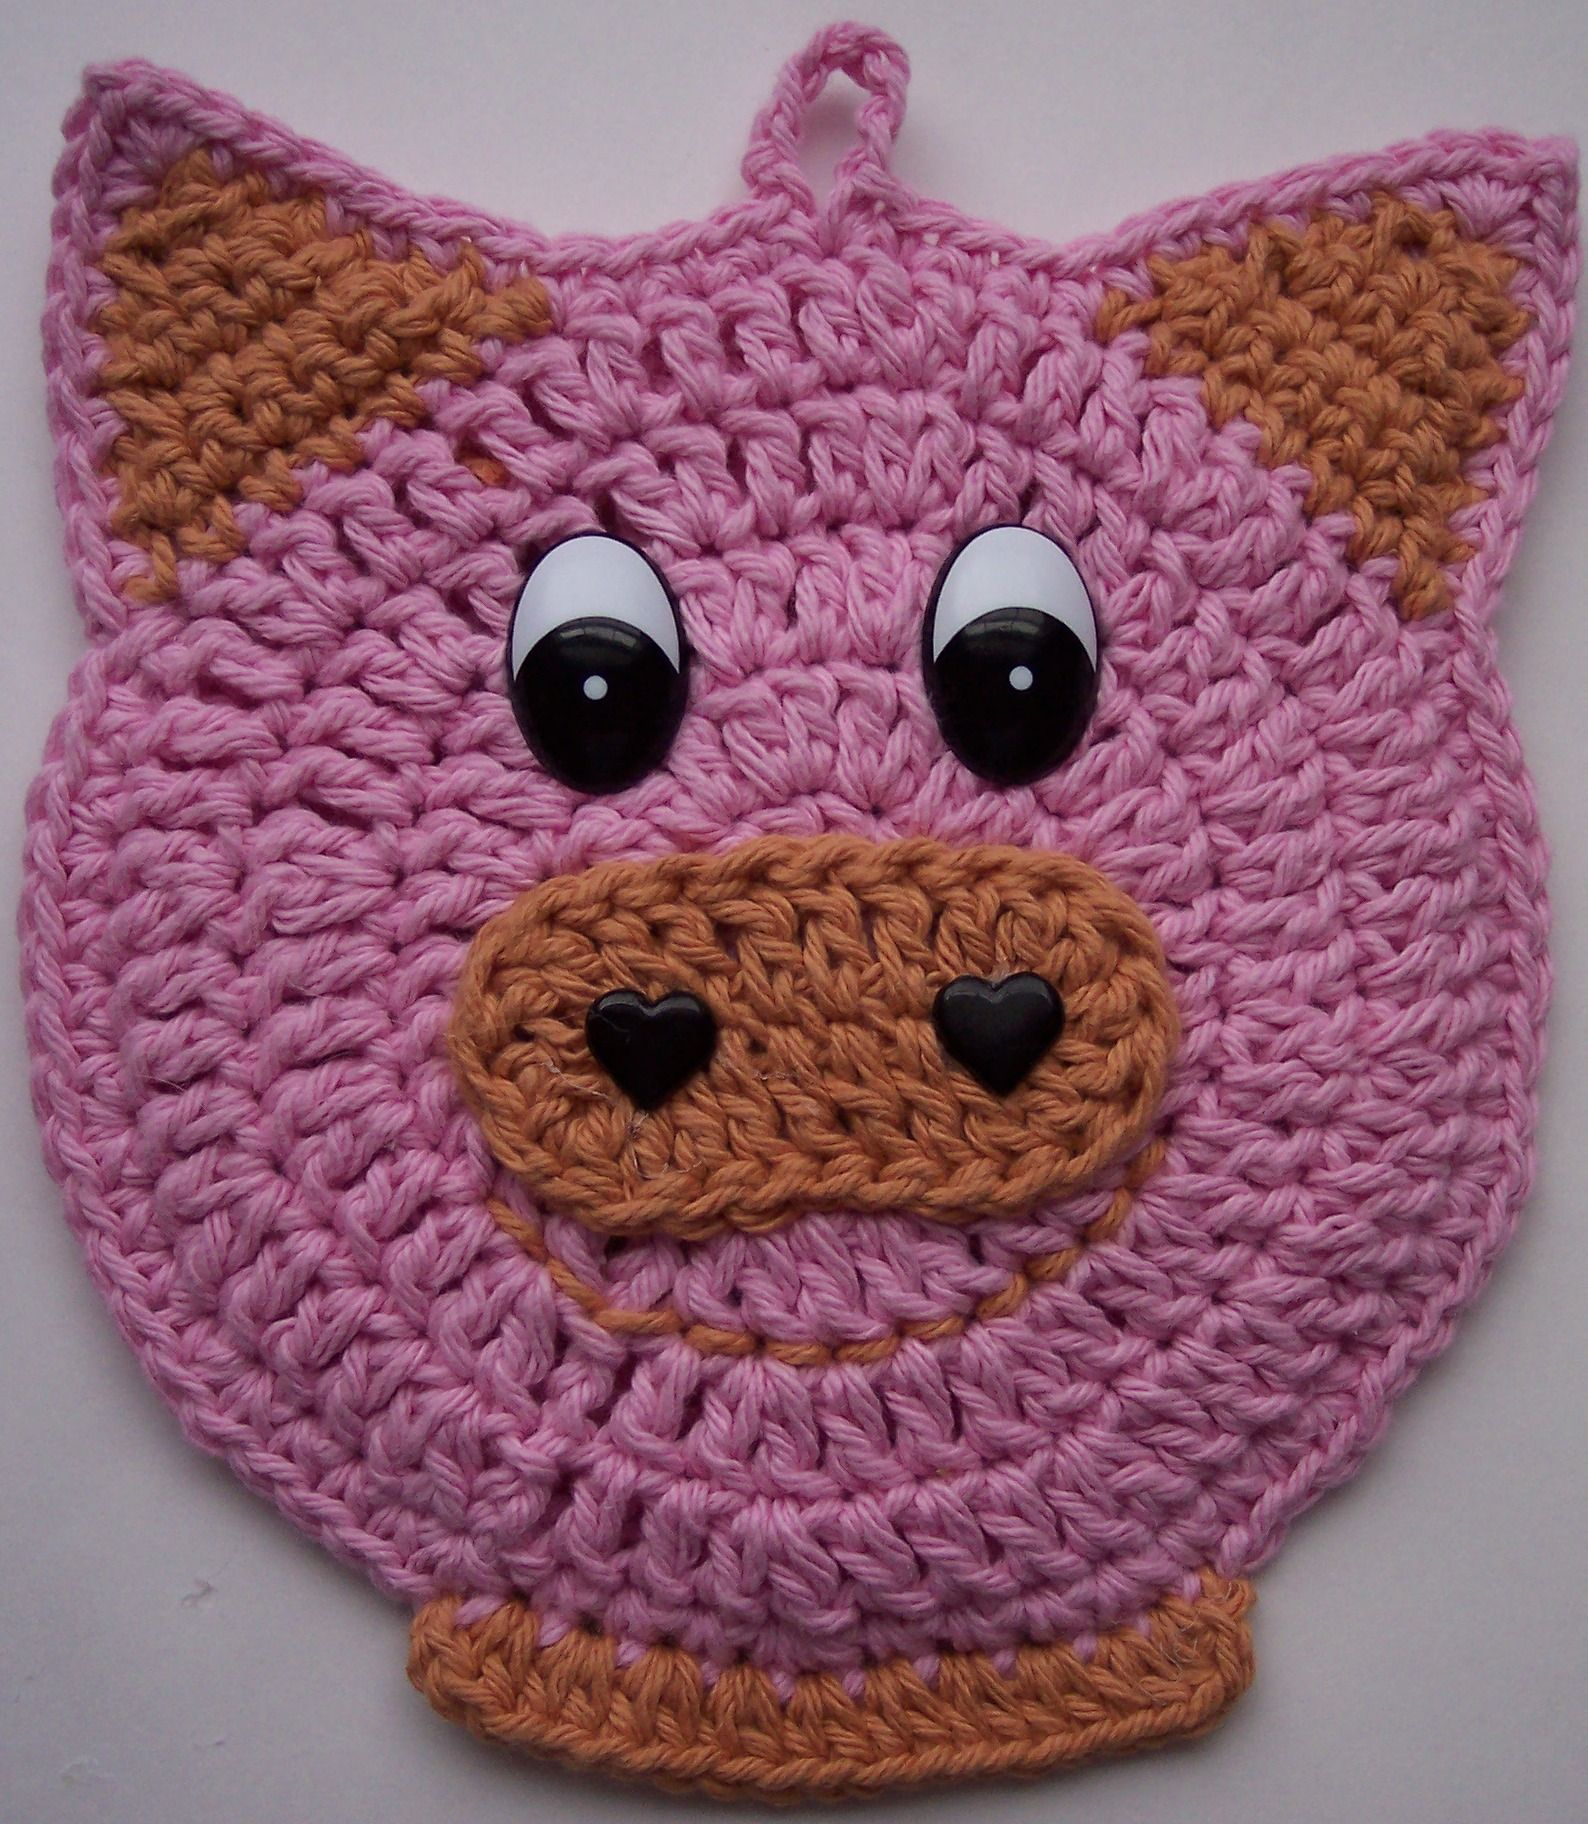 Crochet Pig Potholder | Proyectos que intentar | Pinterest ...